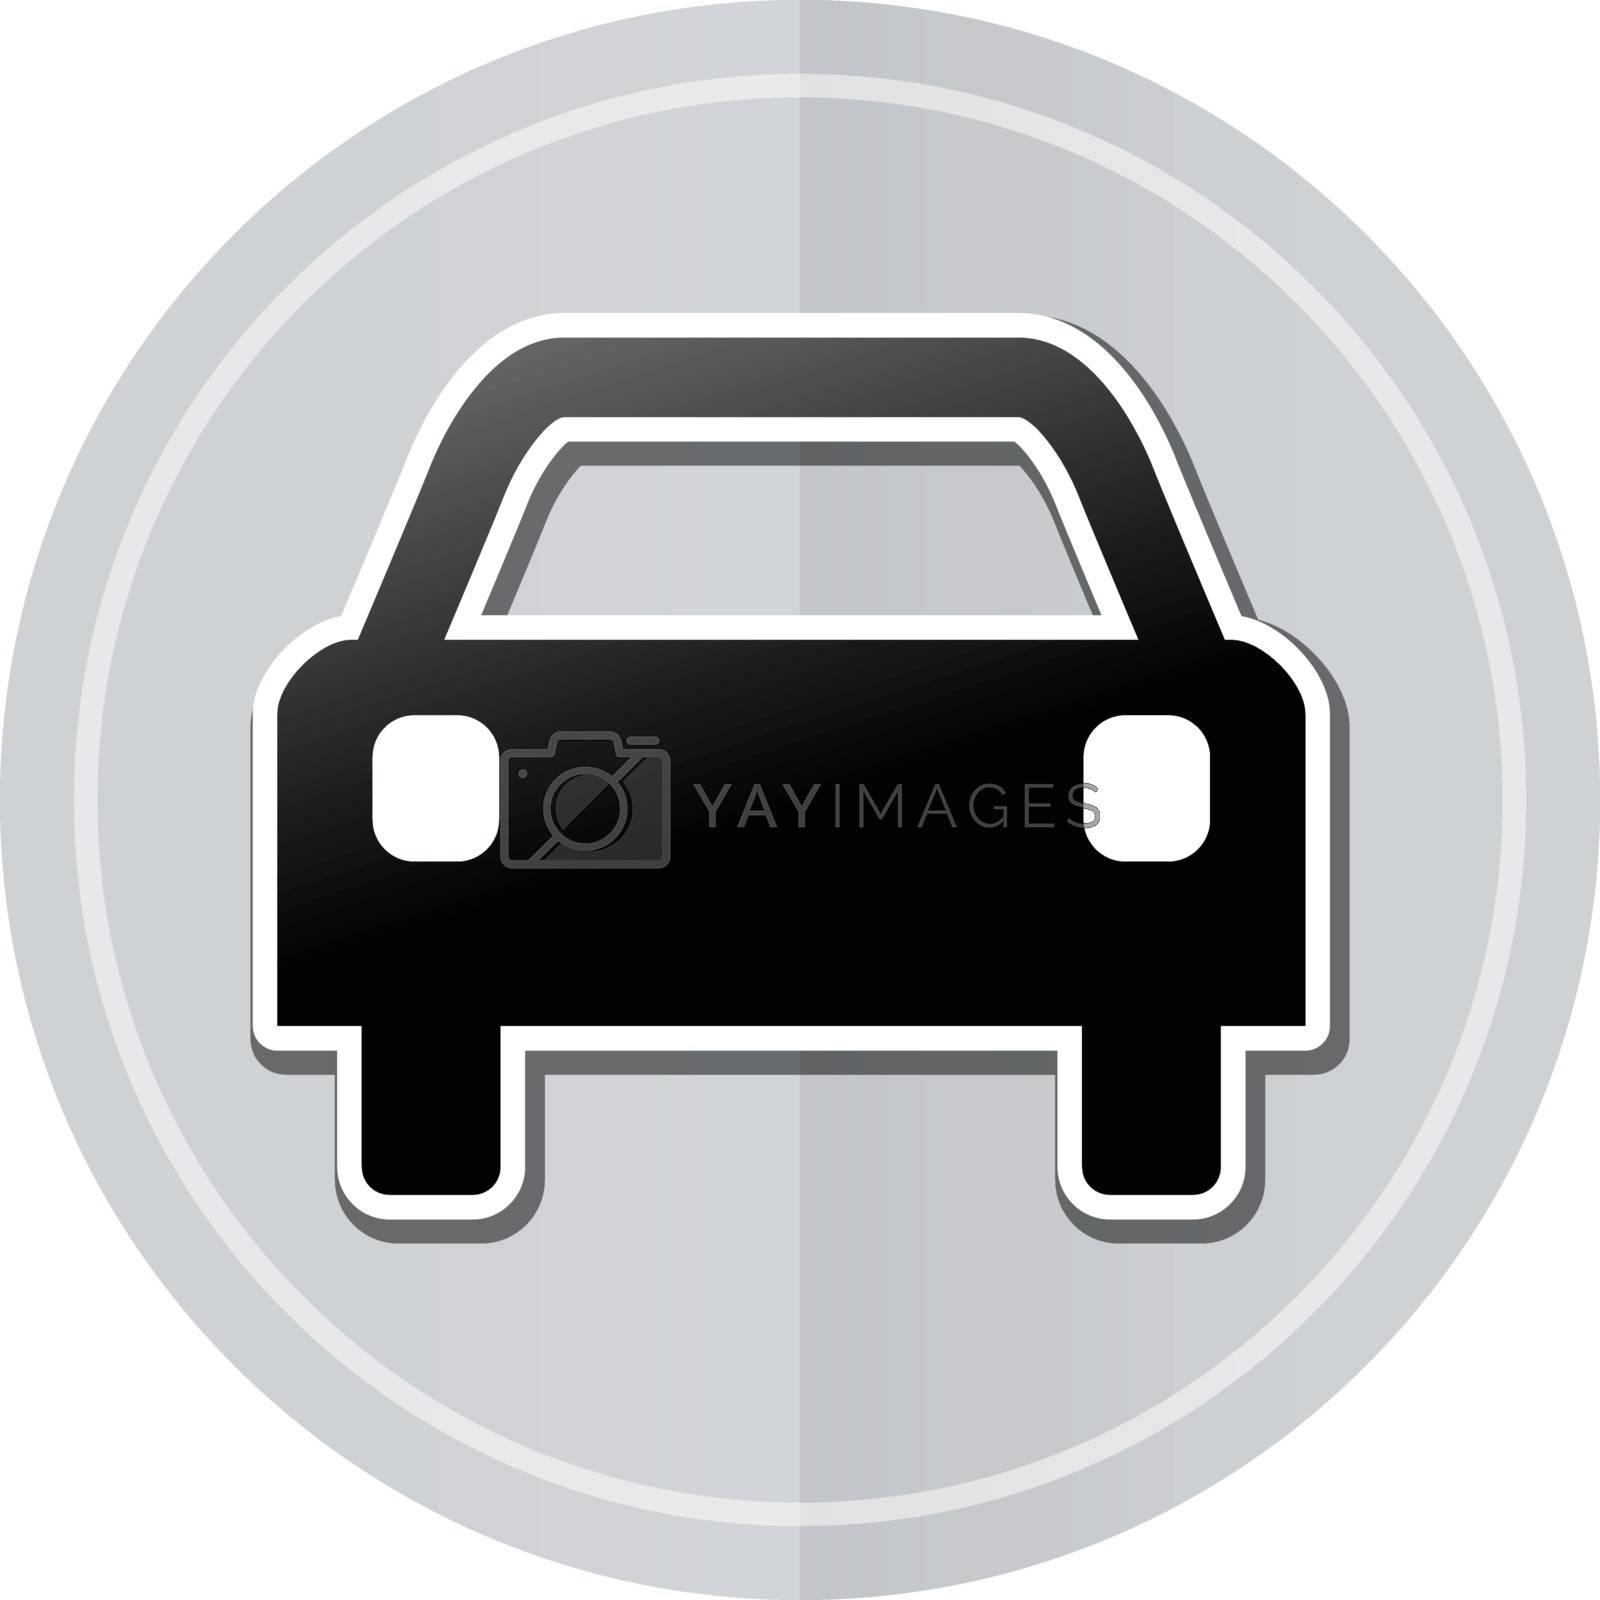 Illustration of car sticker icon simple design